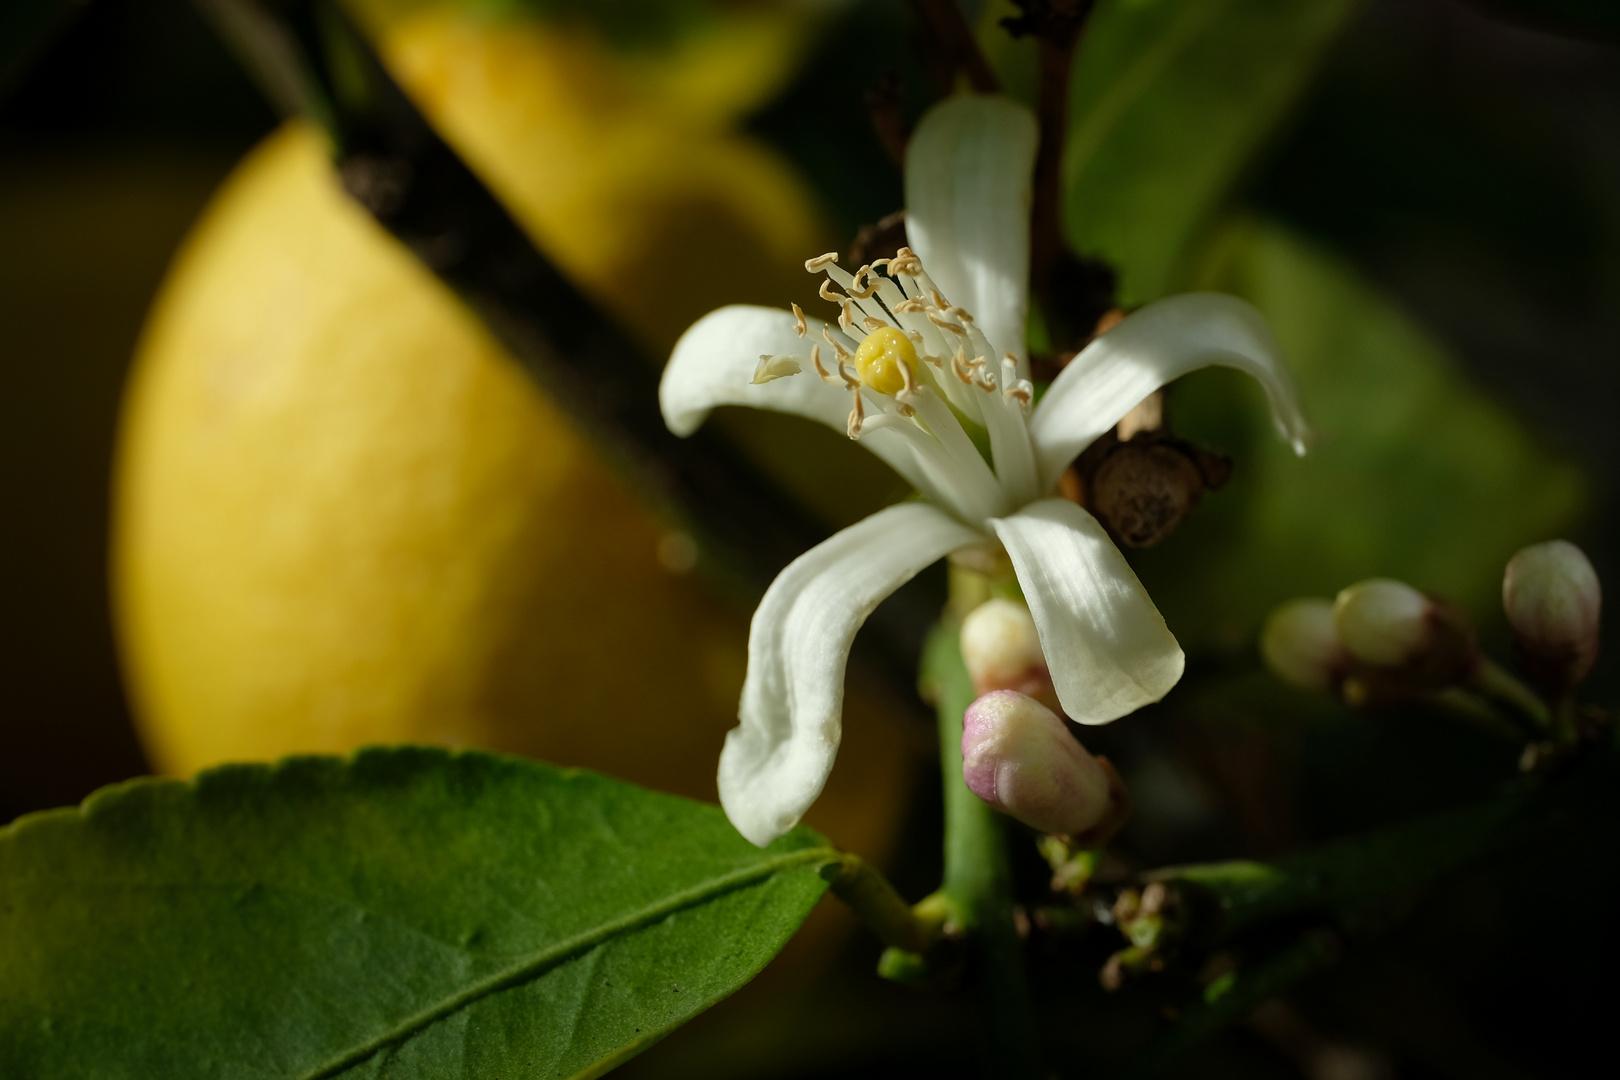 Duft der Zitronen